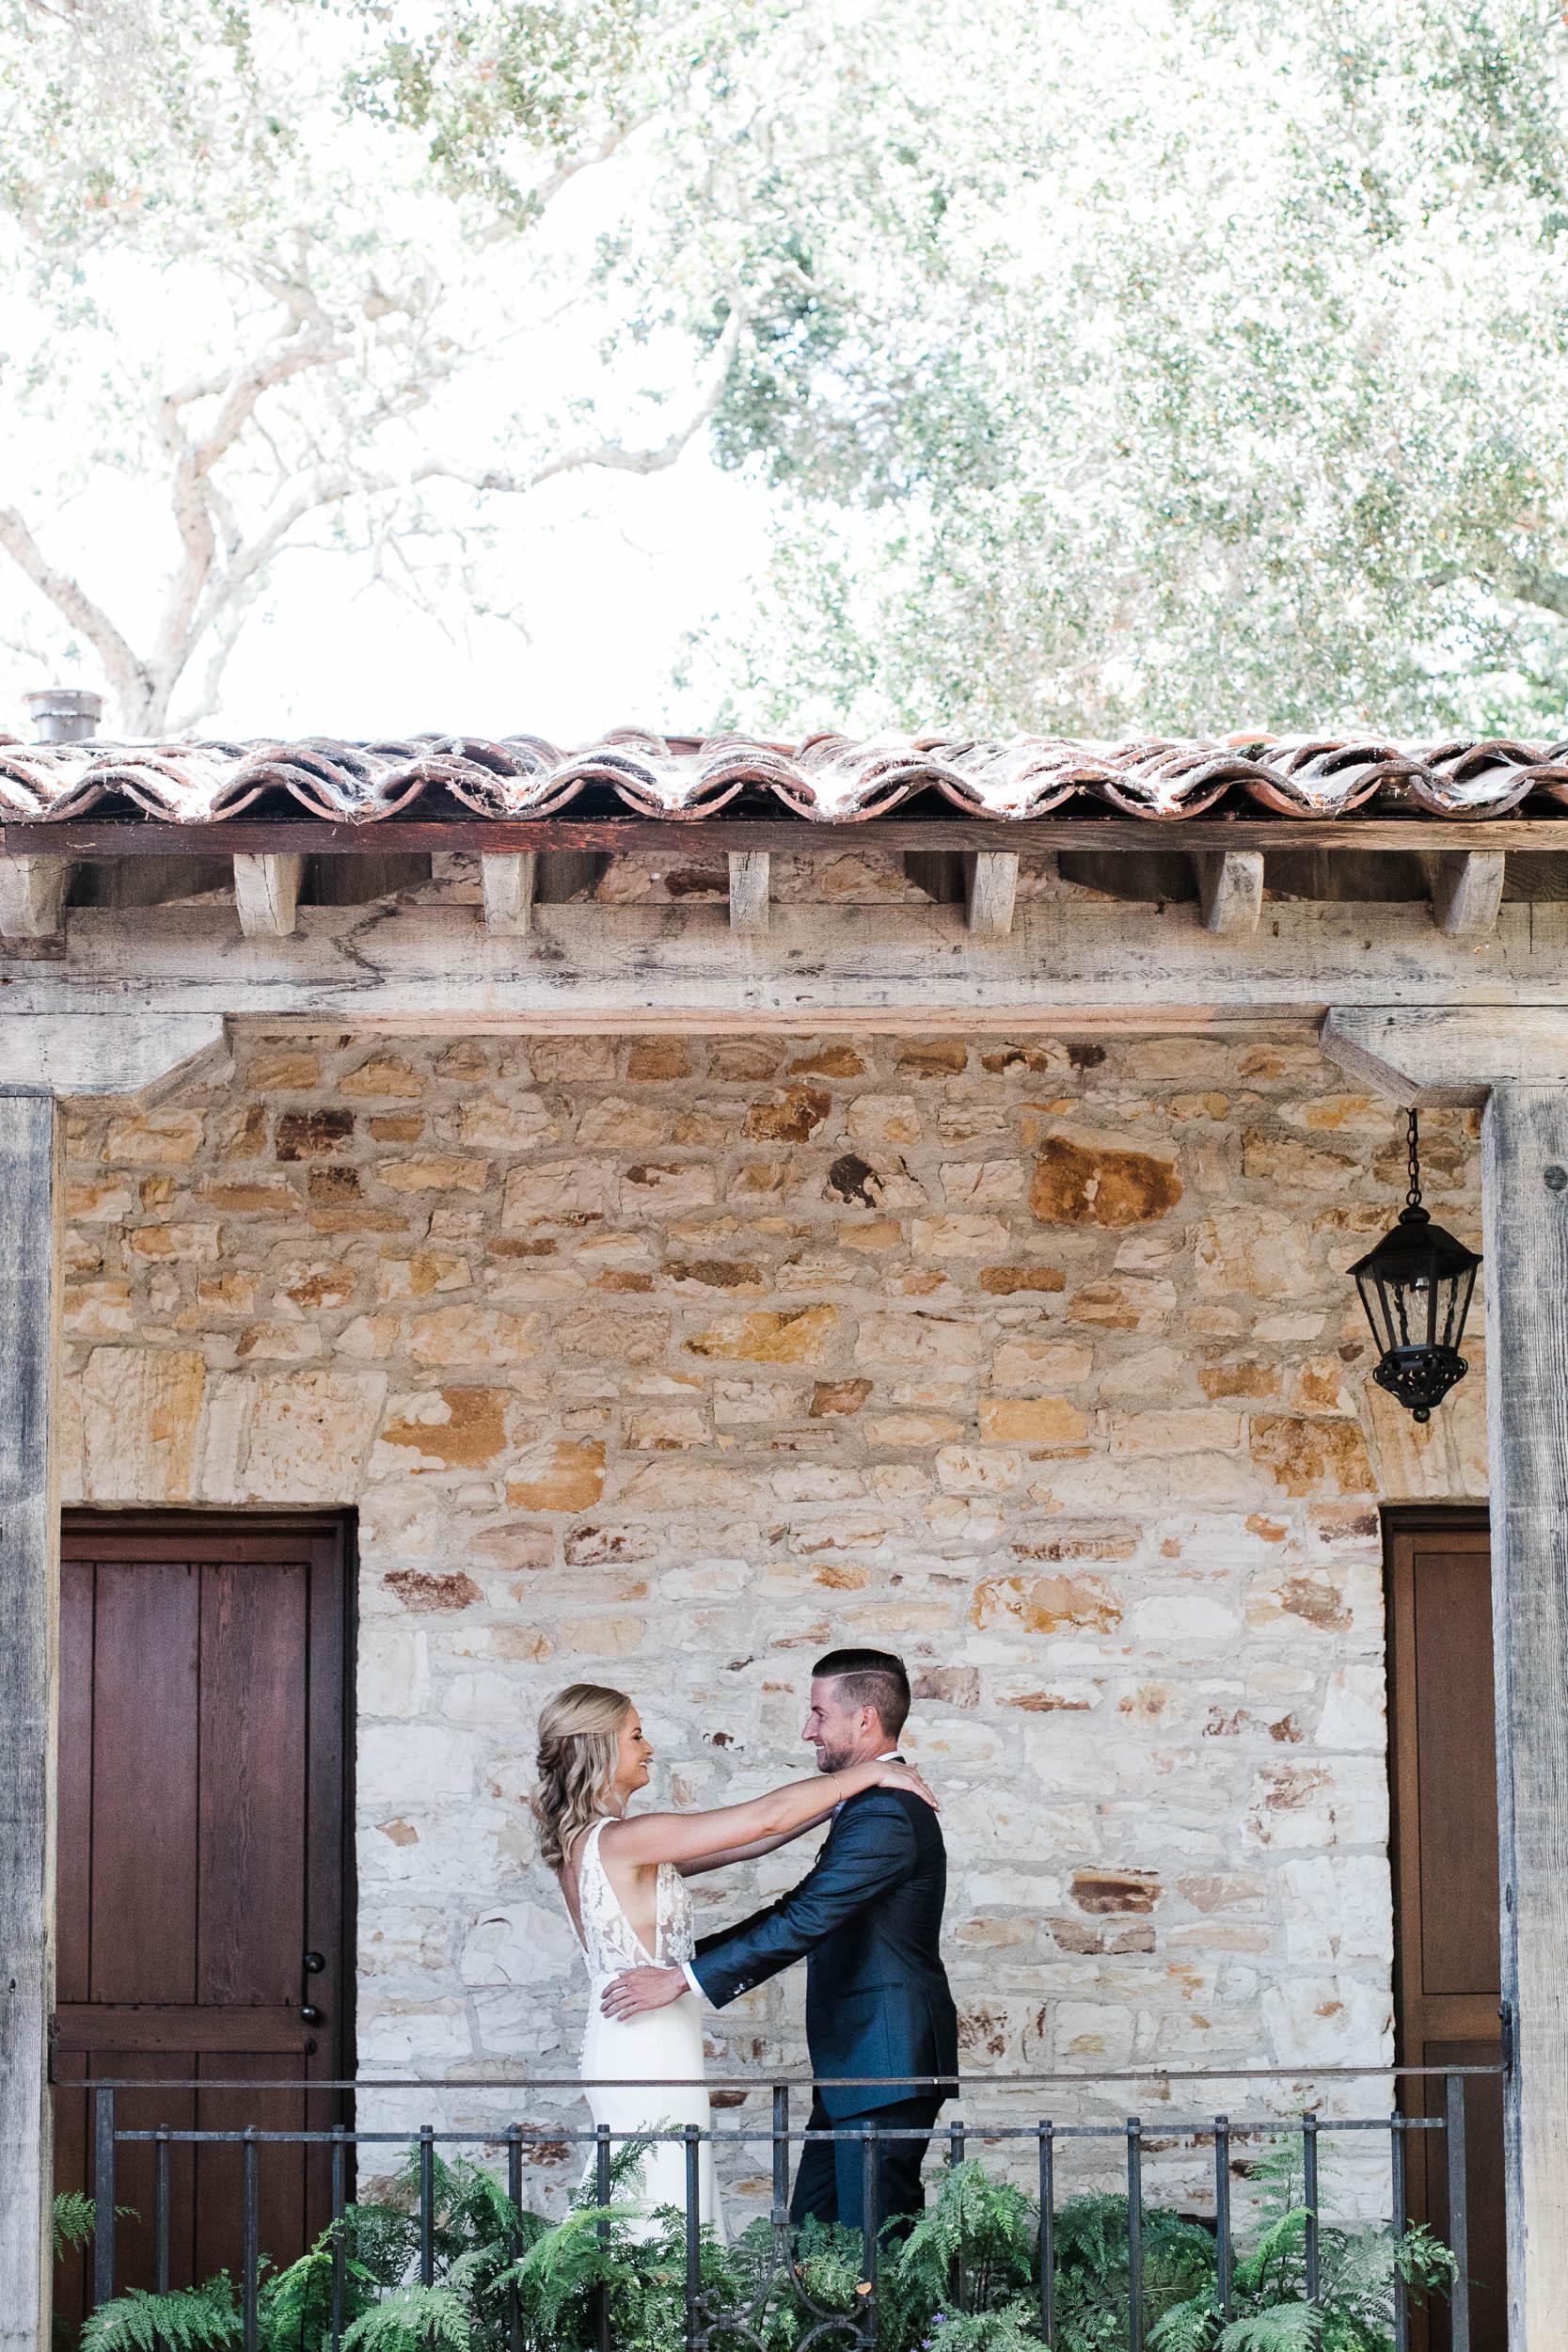 016_072118_D+K_Holman Ranch Wedding_Buena Lane Photography_0160ER copy.jpg